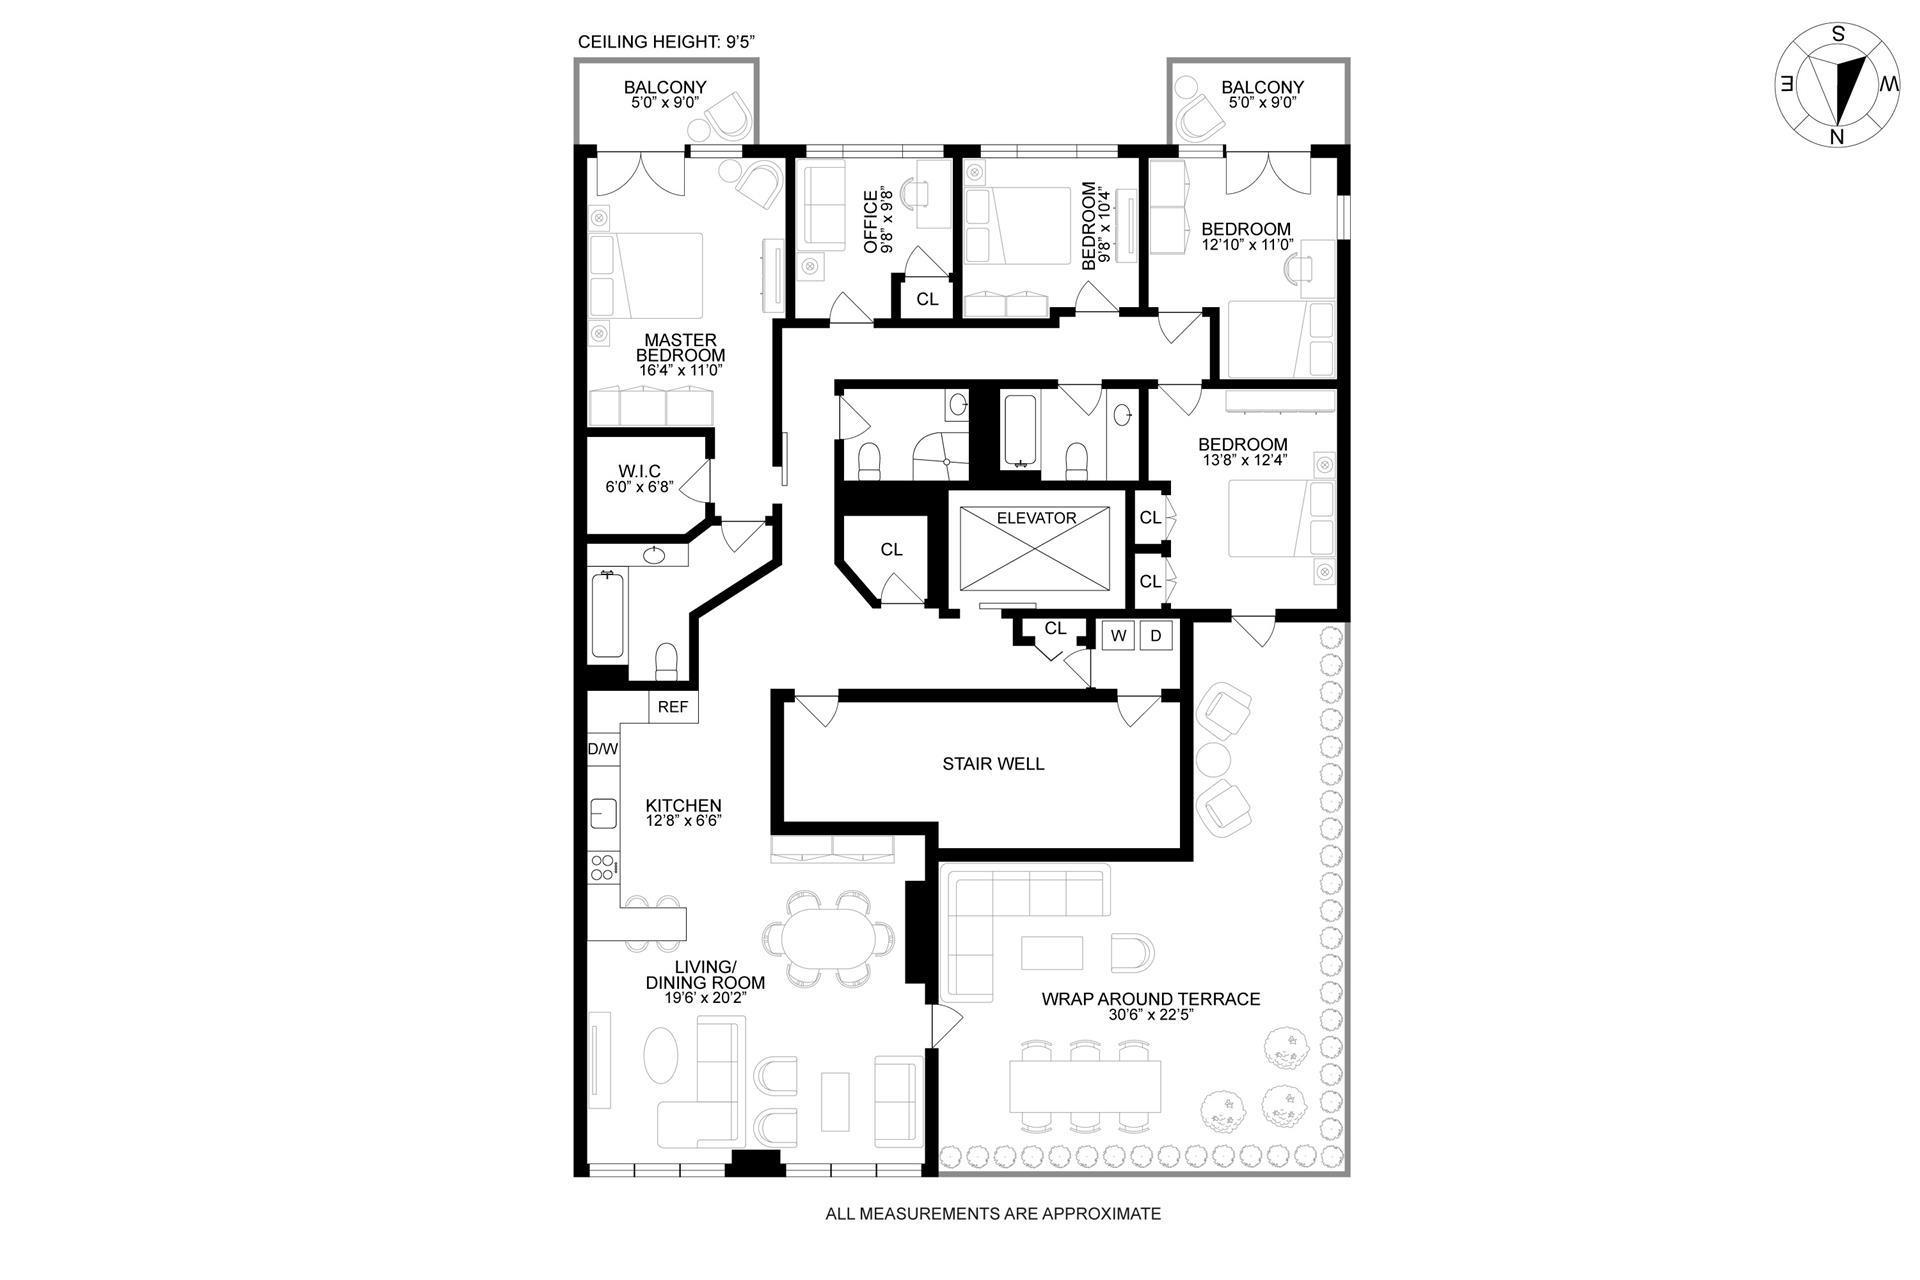 Floor plan of 659 Bergen St, PHA - Prospect Heights, New York